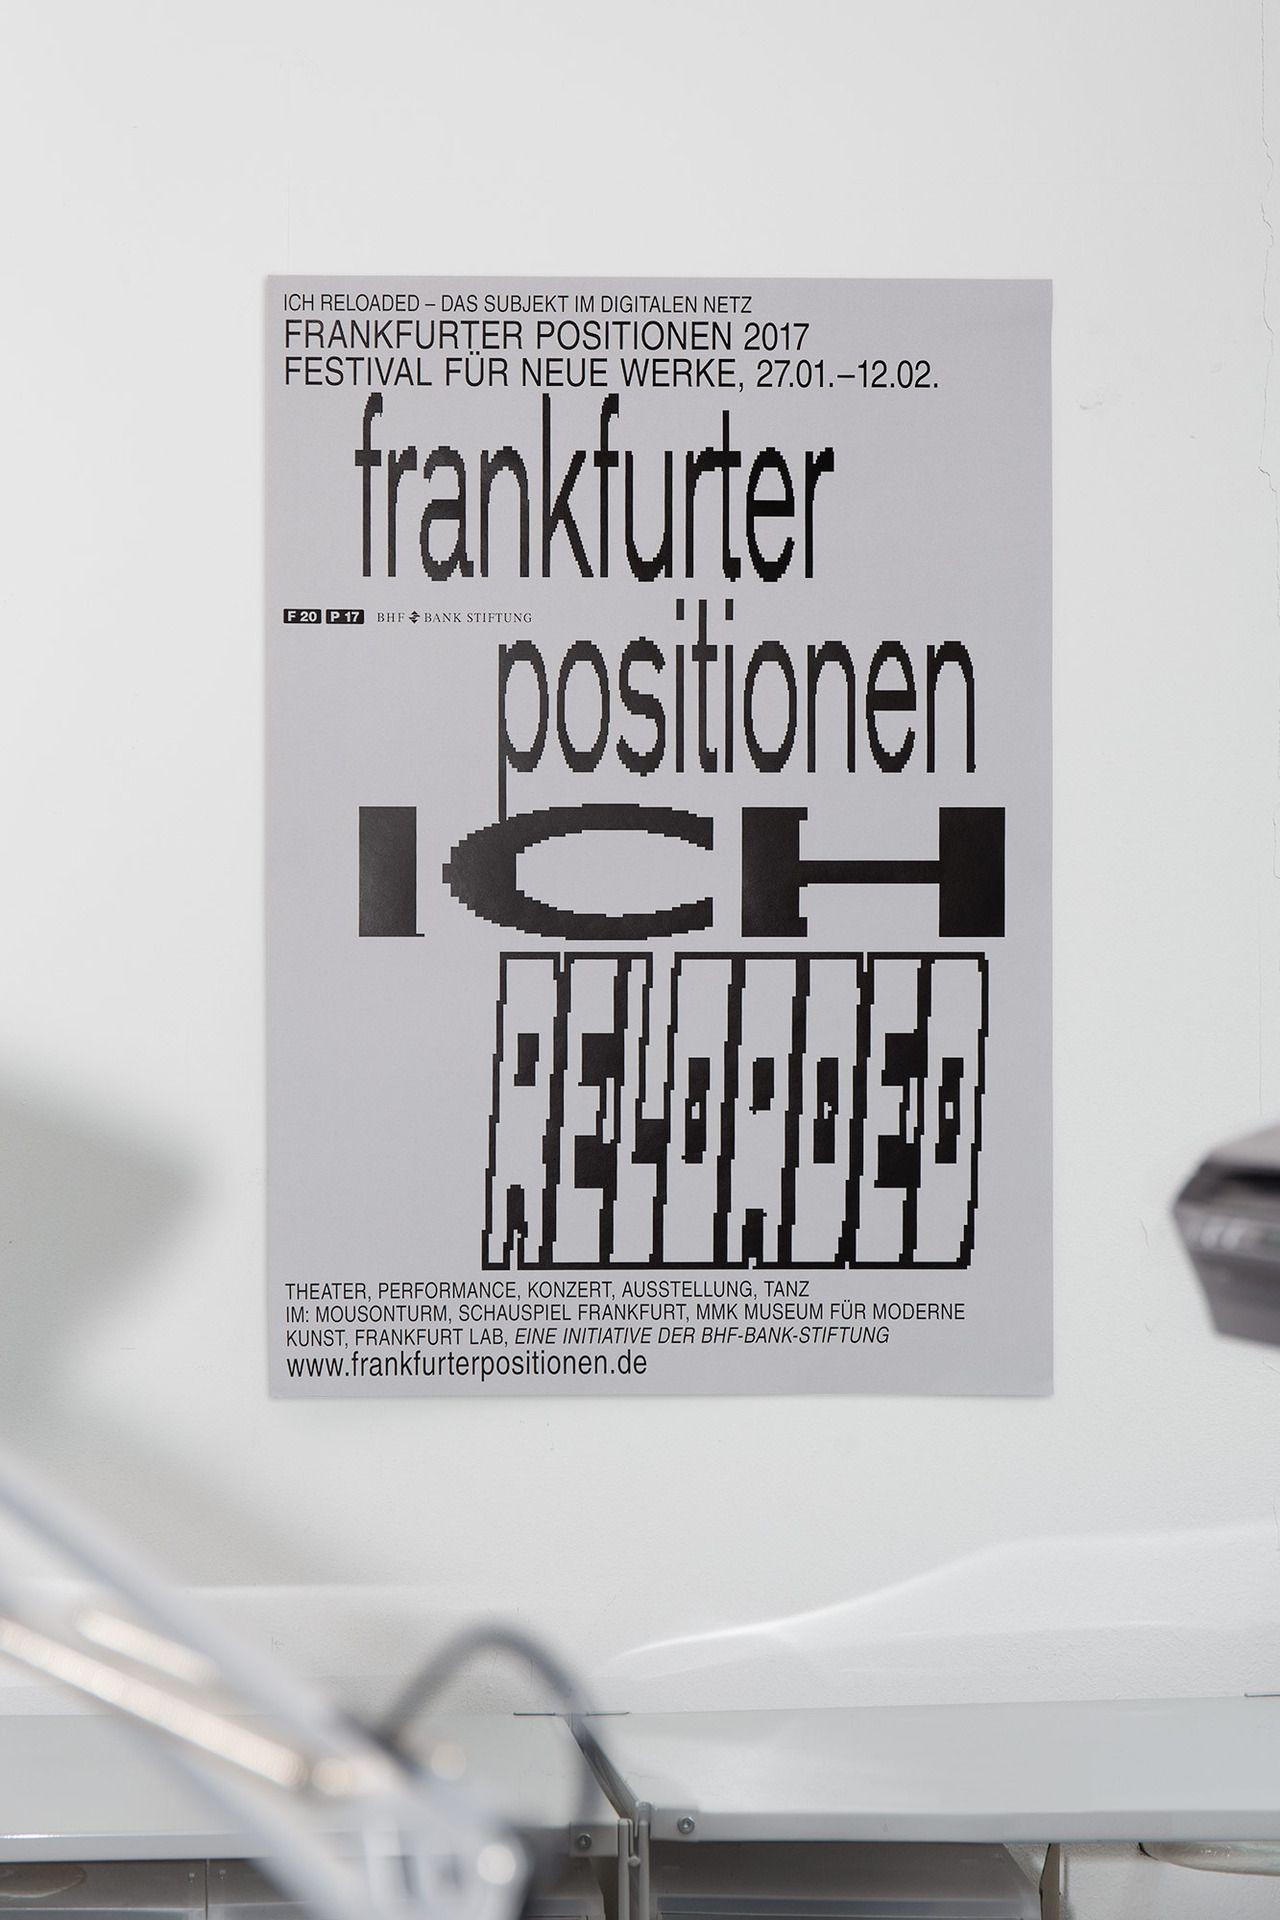 Designeverywhere Frankfurter Positionen 2017 Graphics Thisisgrey Likes Graphic Graphic Design Blog Focus